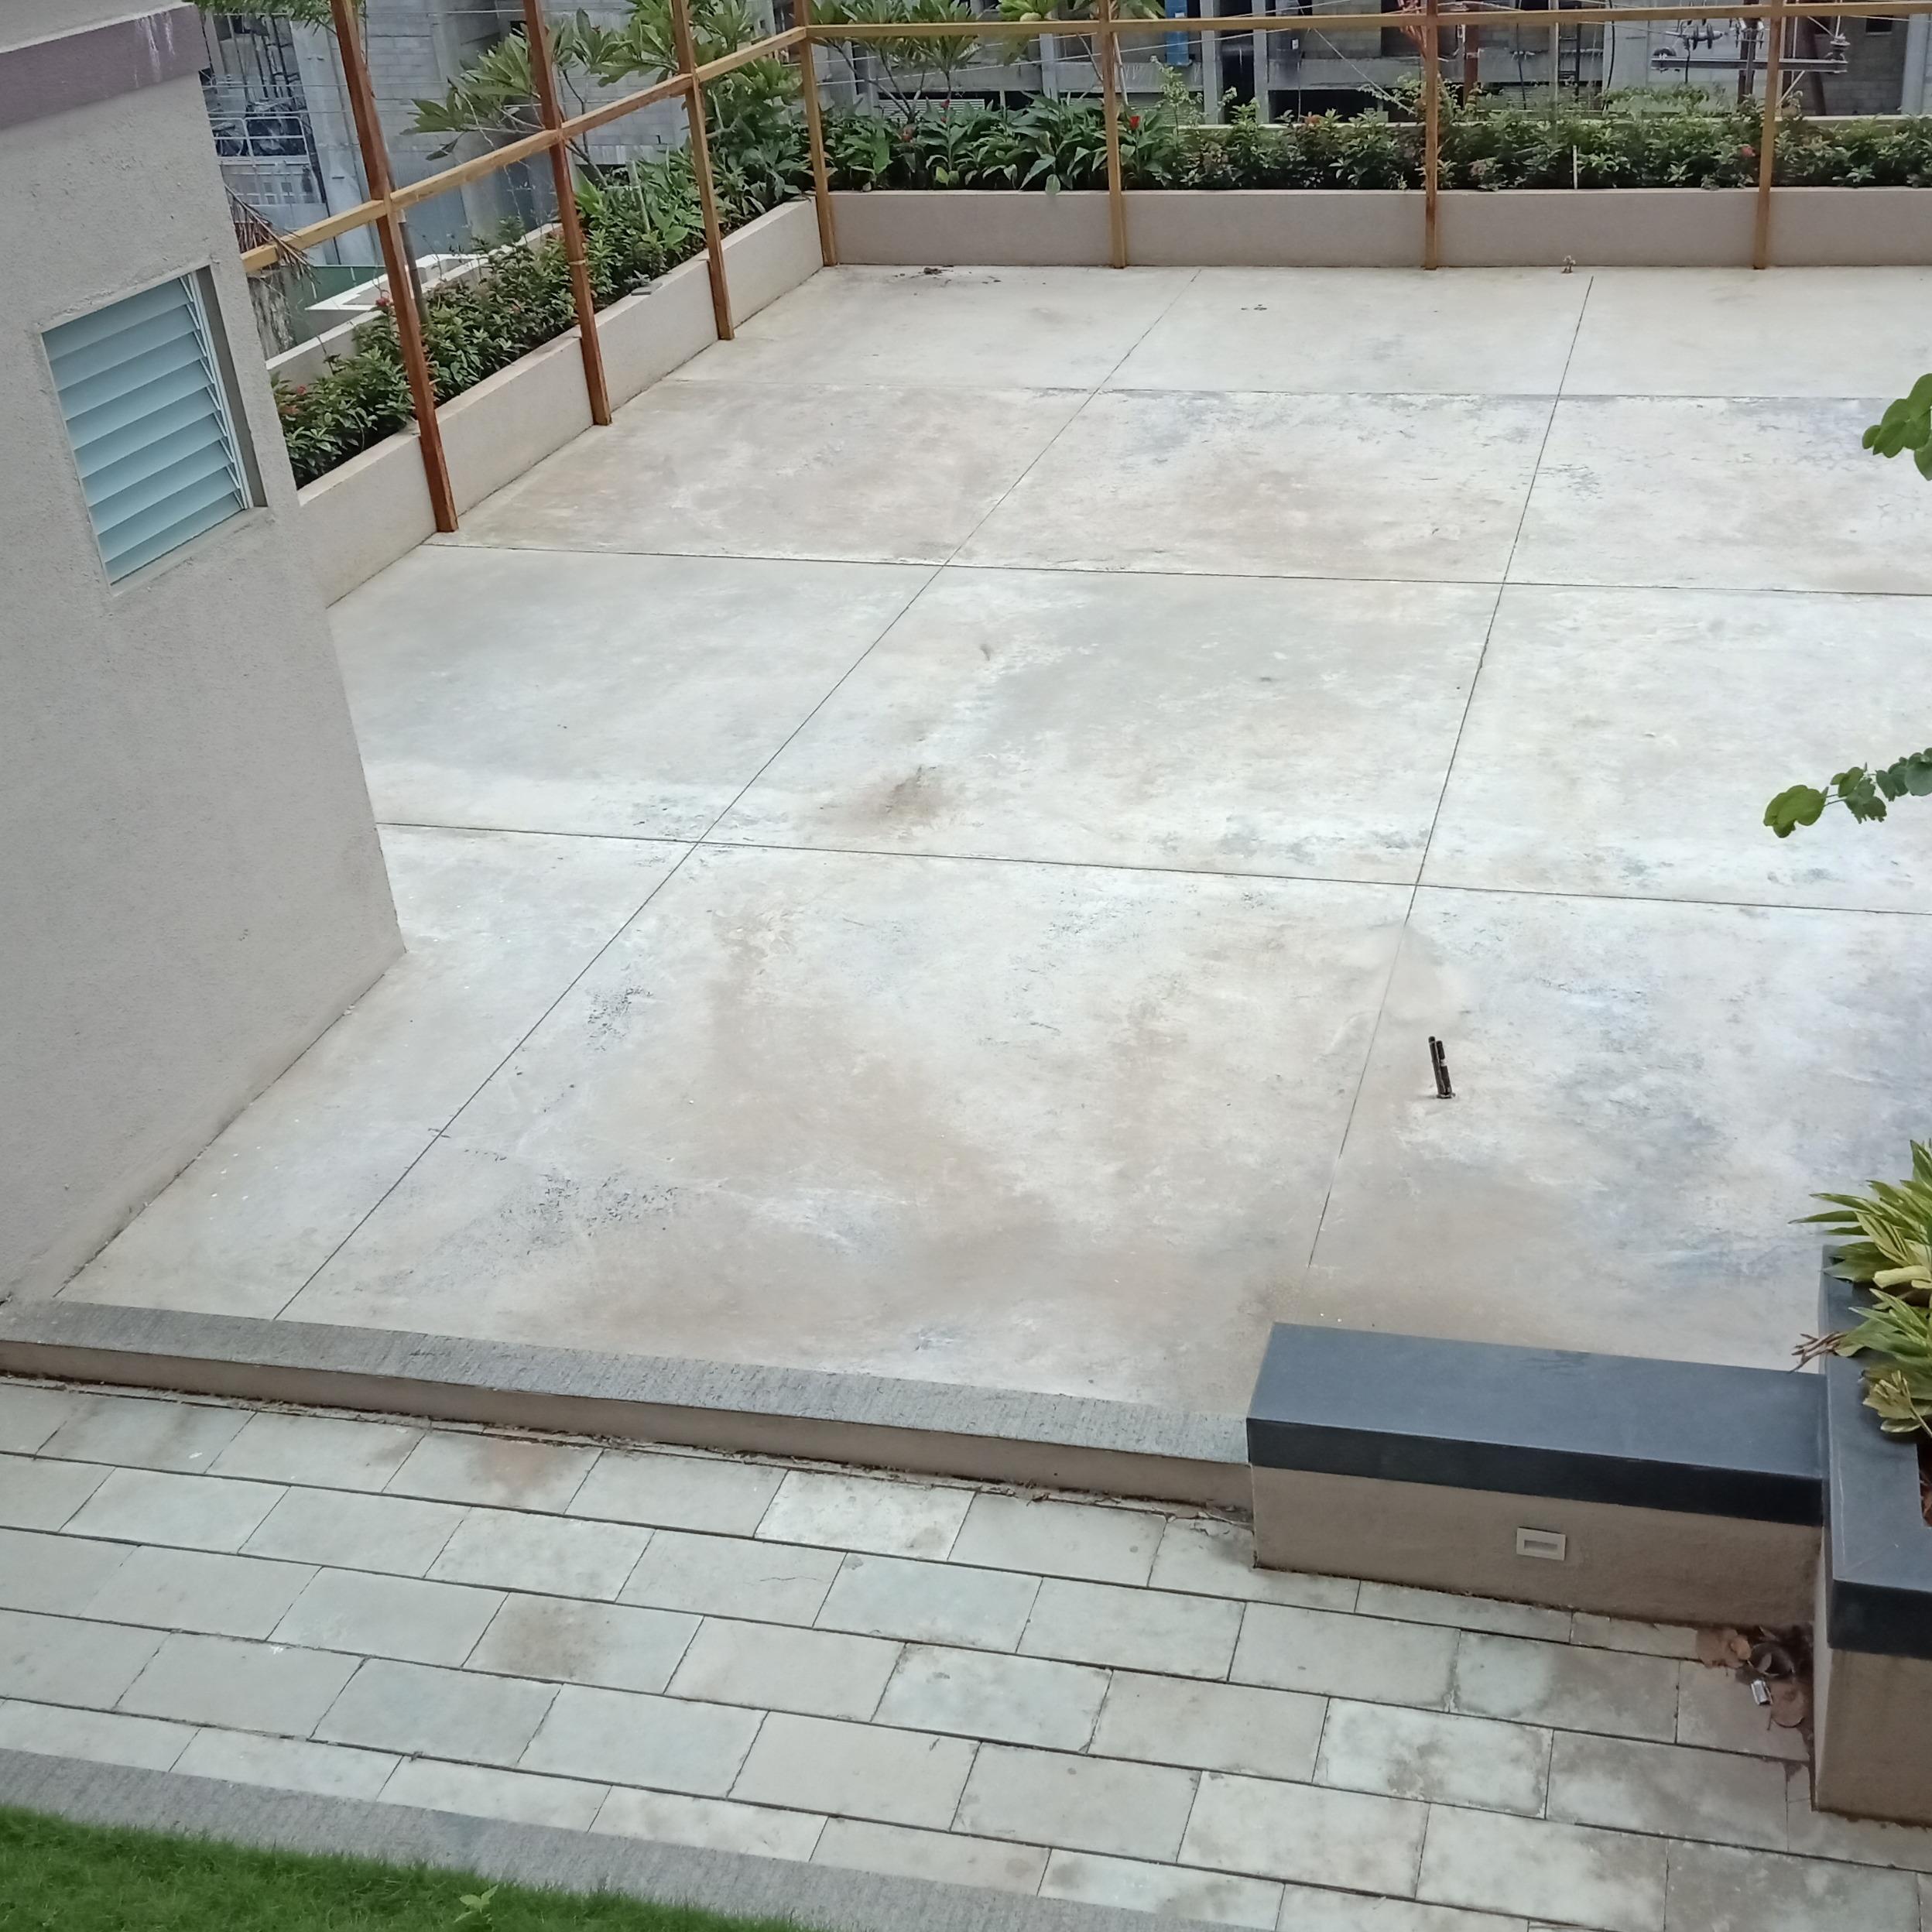 Terrace Picture